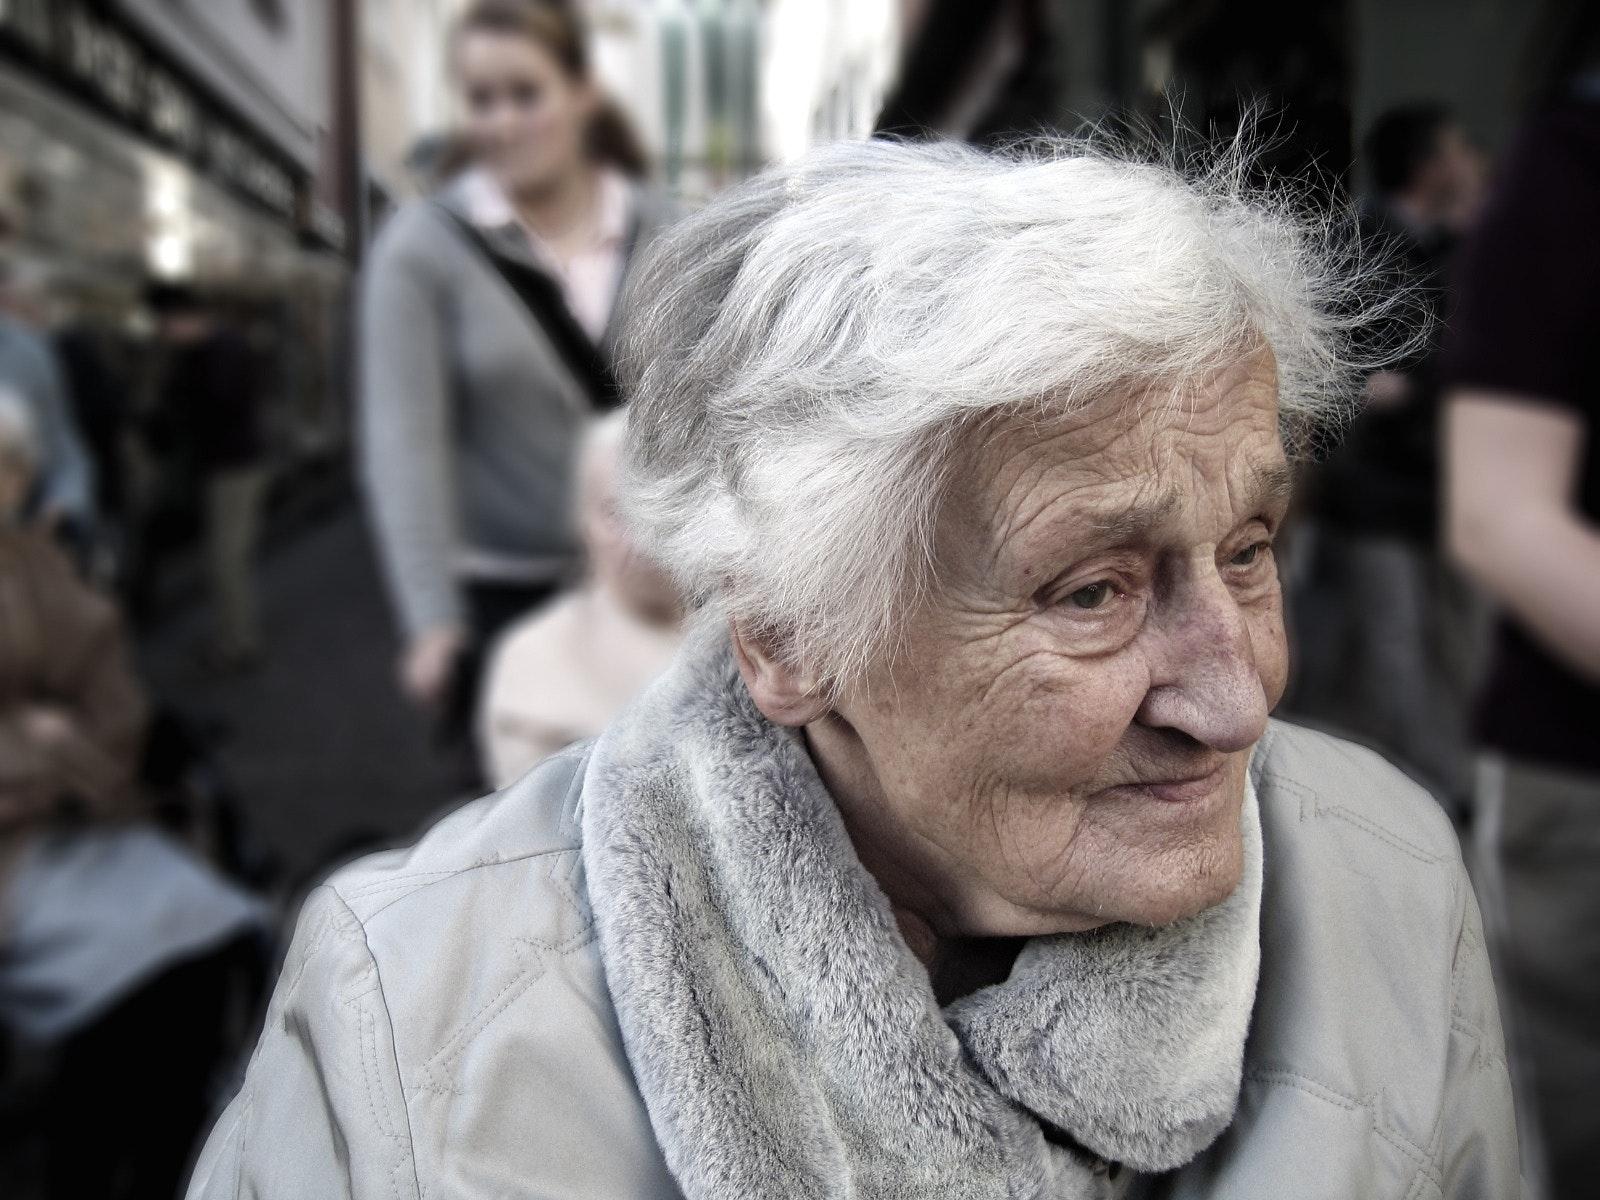 1000+ interesting old lady photos · pexels · free stock photos